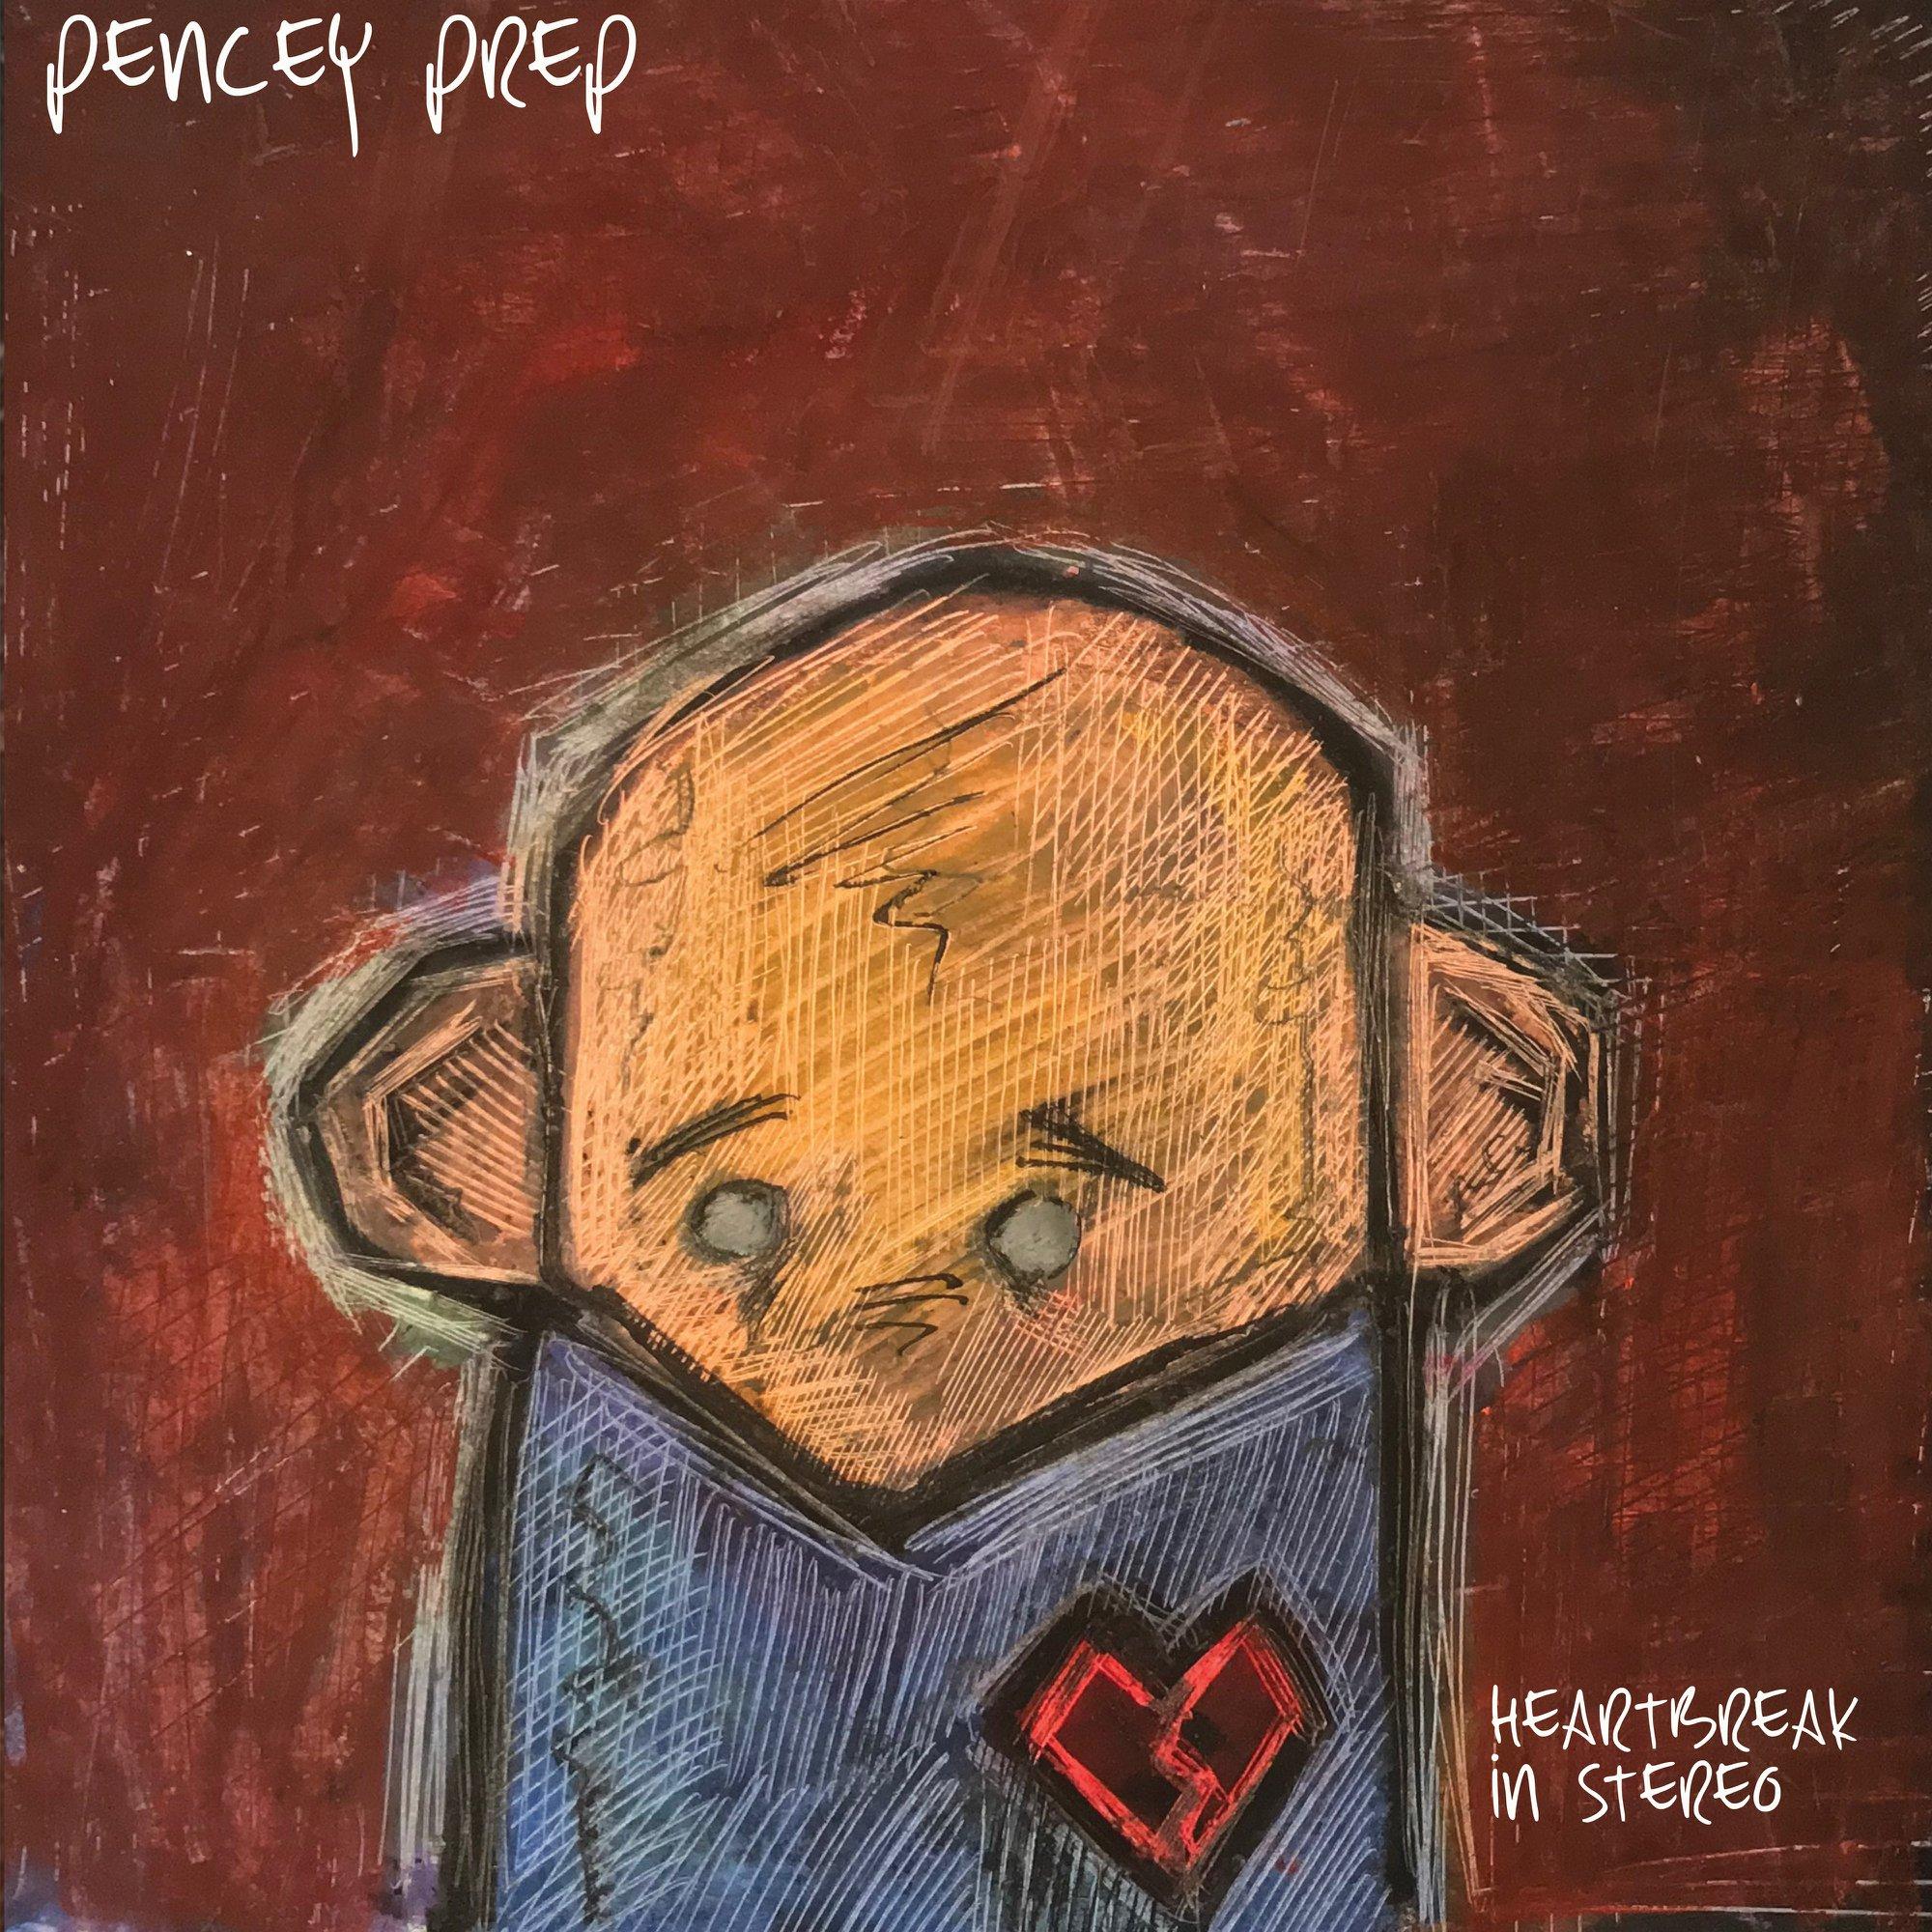 Pencey Prep - Heartbreak In Stereo